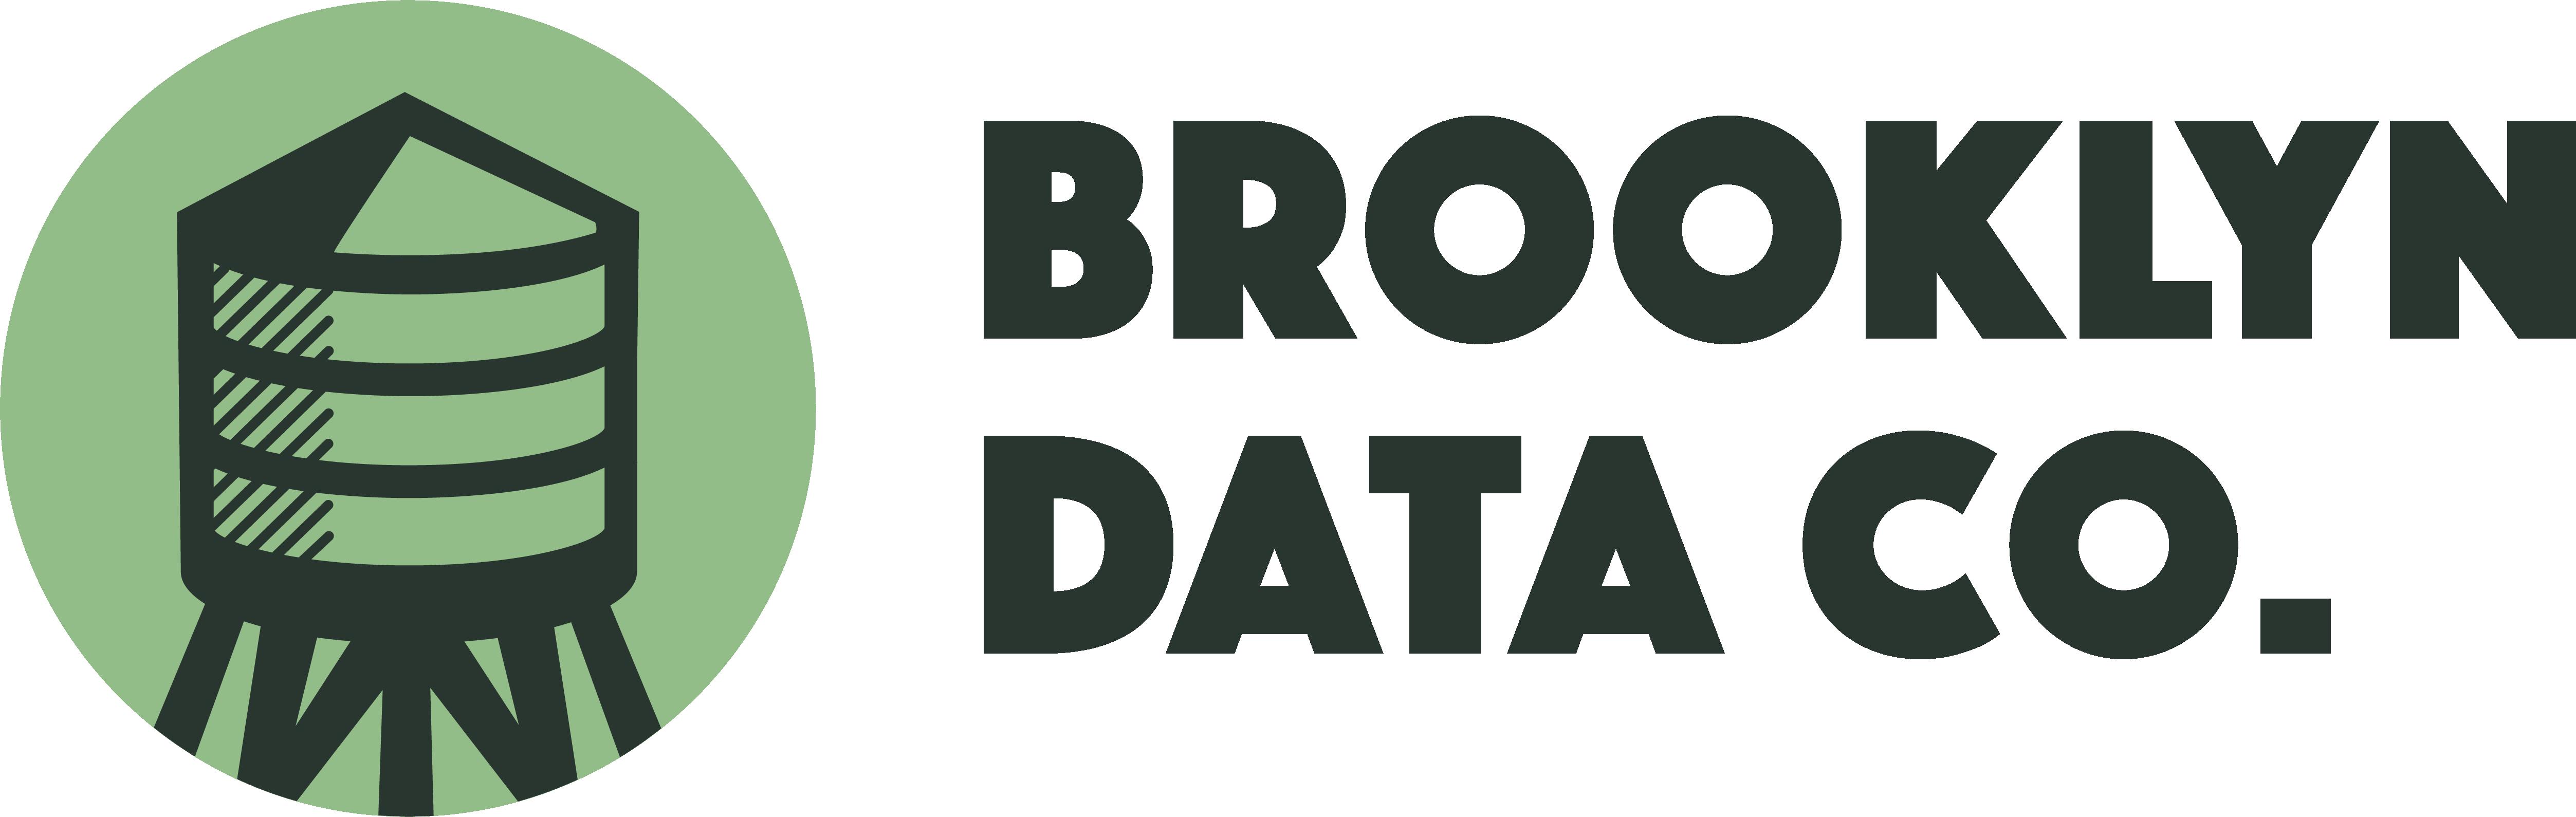 Brooklyn Data Co